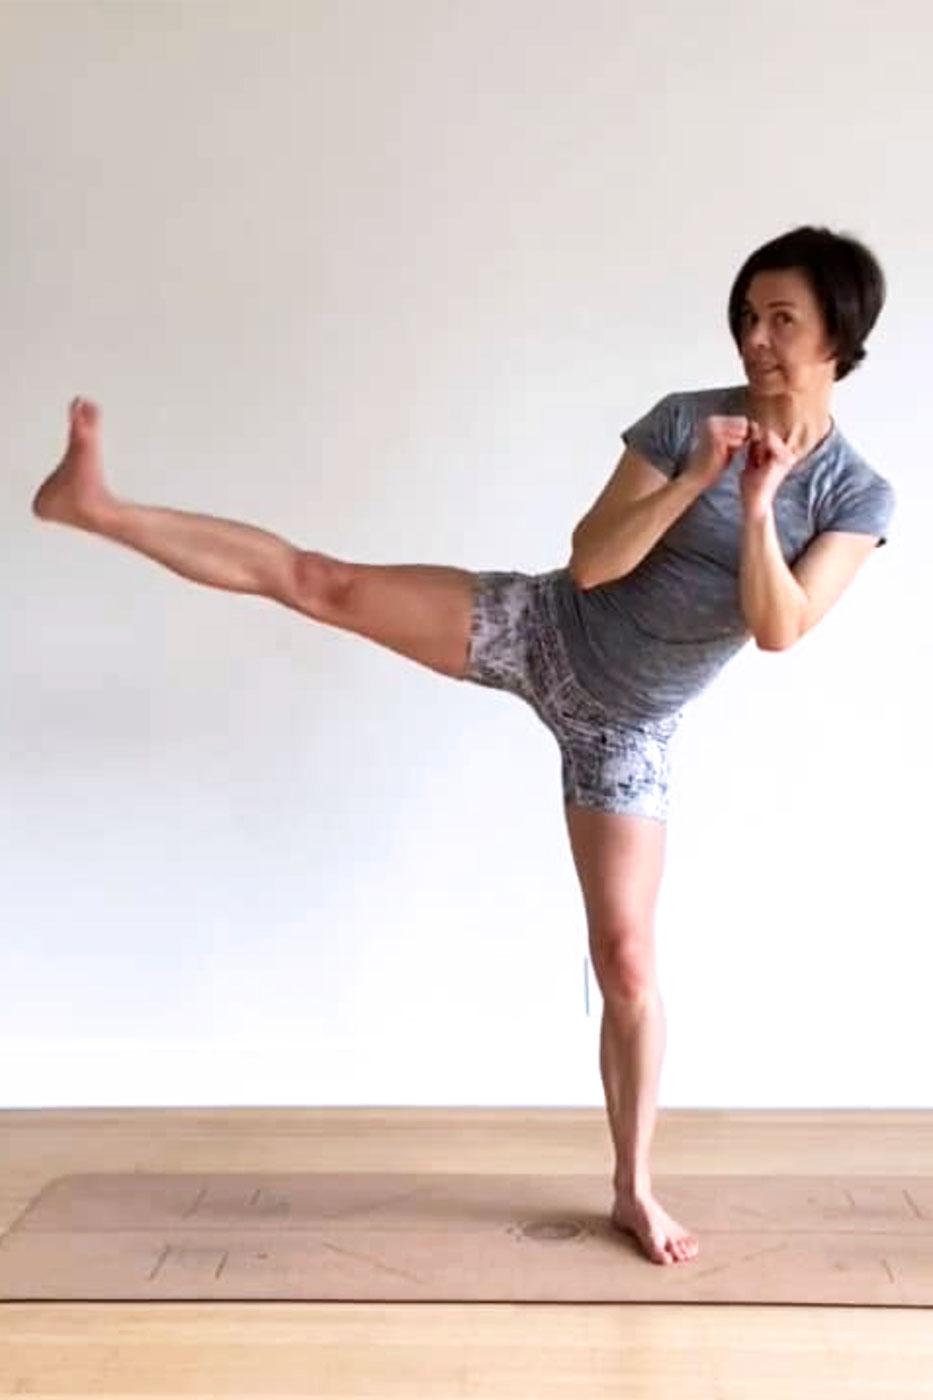 Cardio Kickboxing & Strength Workout